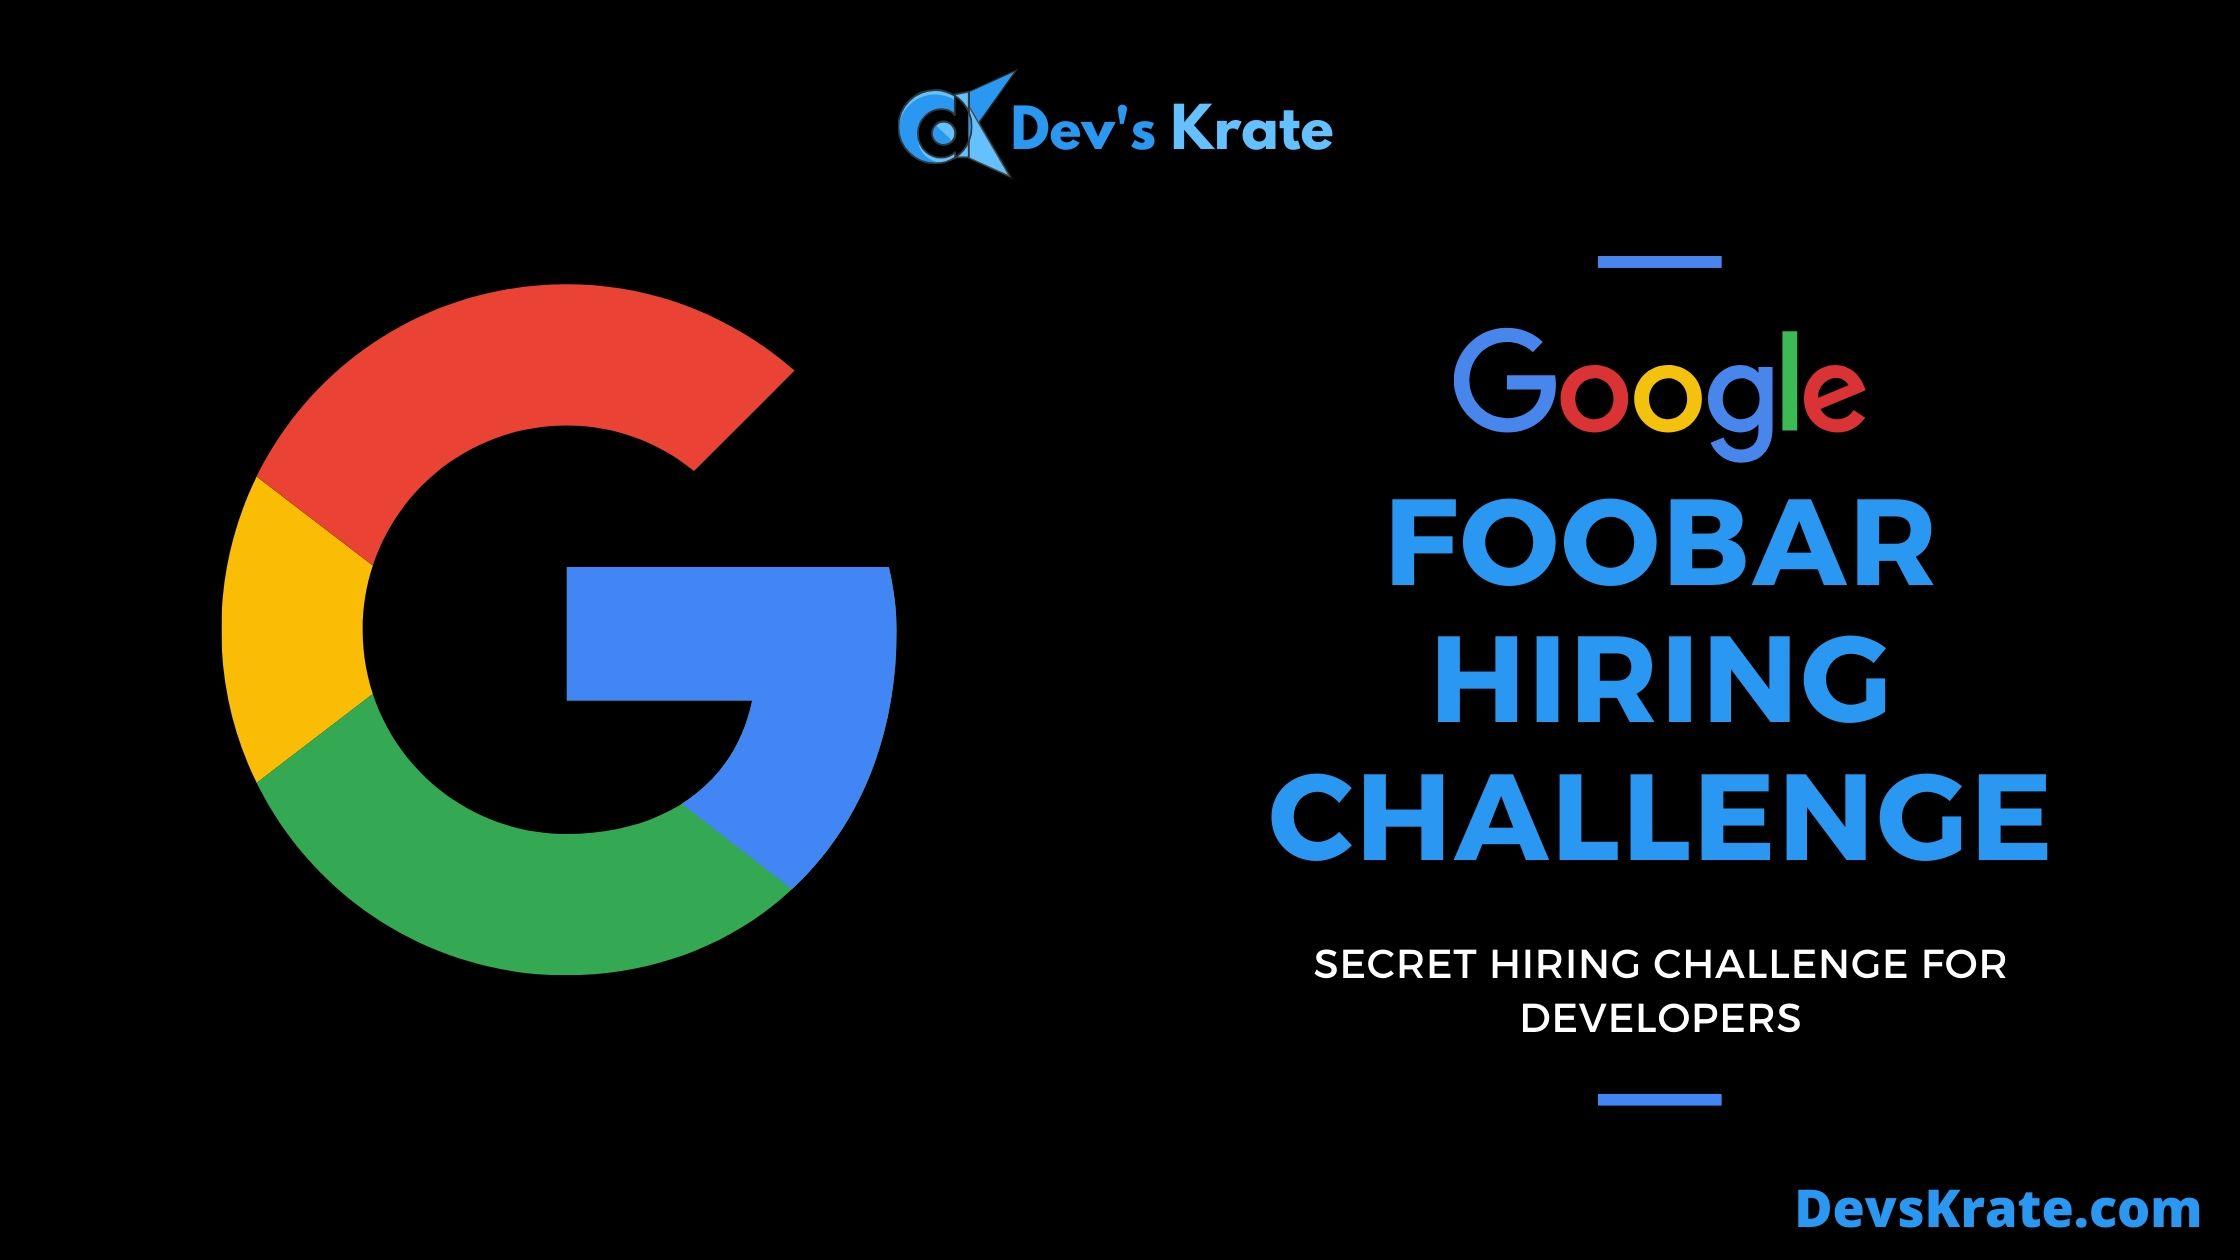 Google's FooBar - The Secret Hiring Challenge